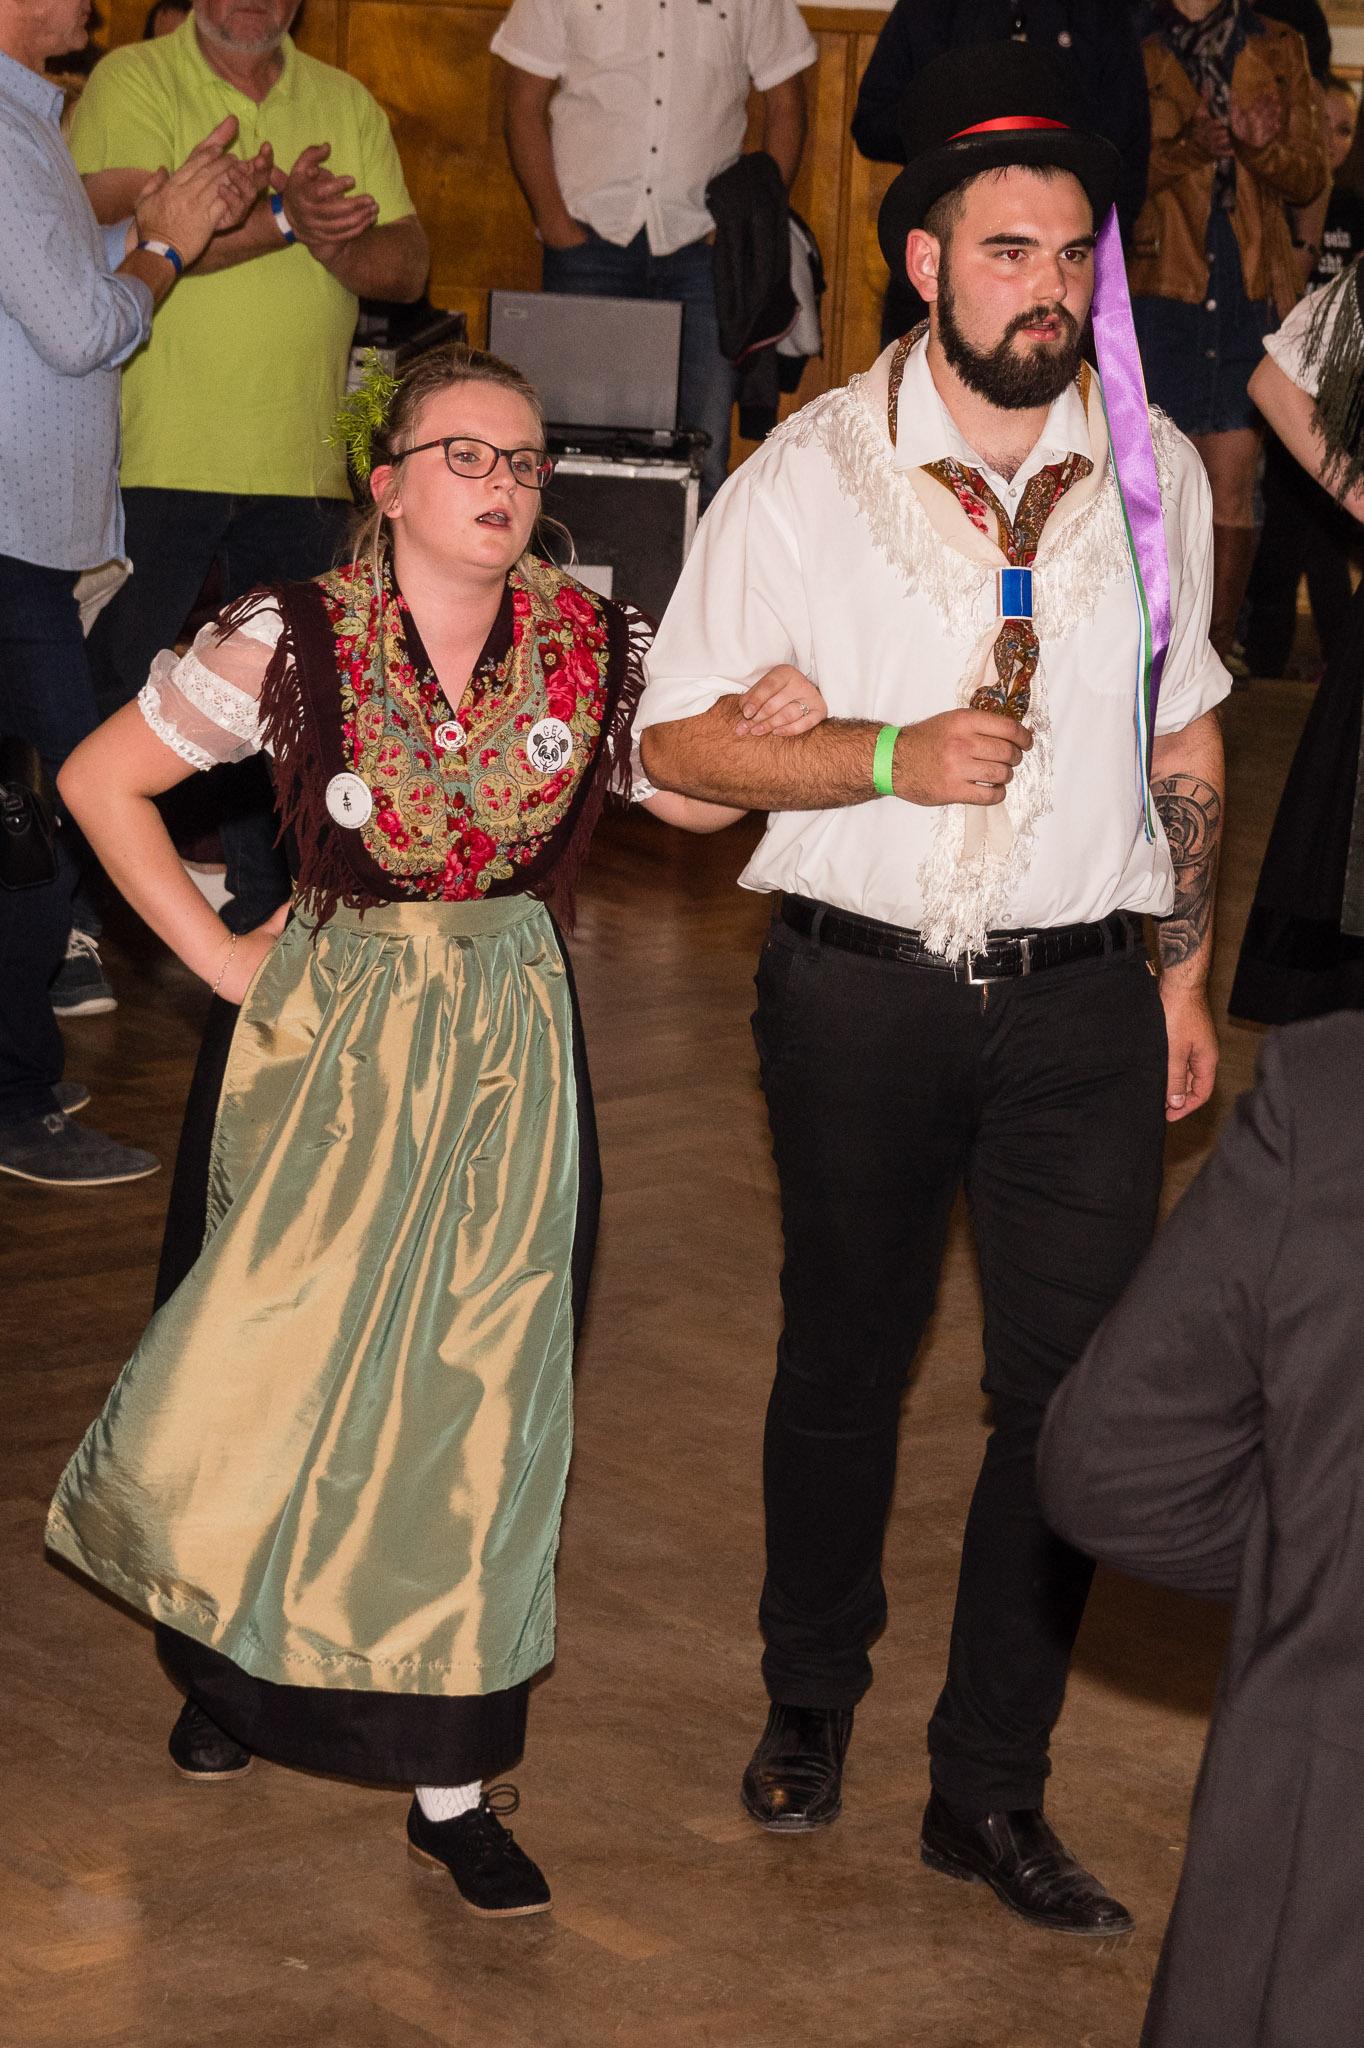 20181019-Kirmes Ummerstadt-DSC00417